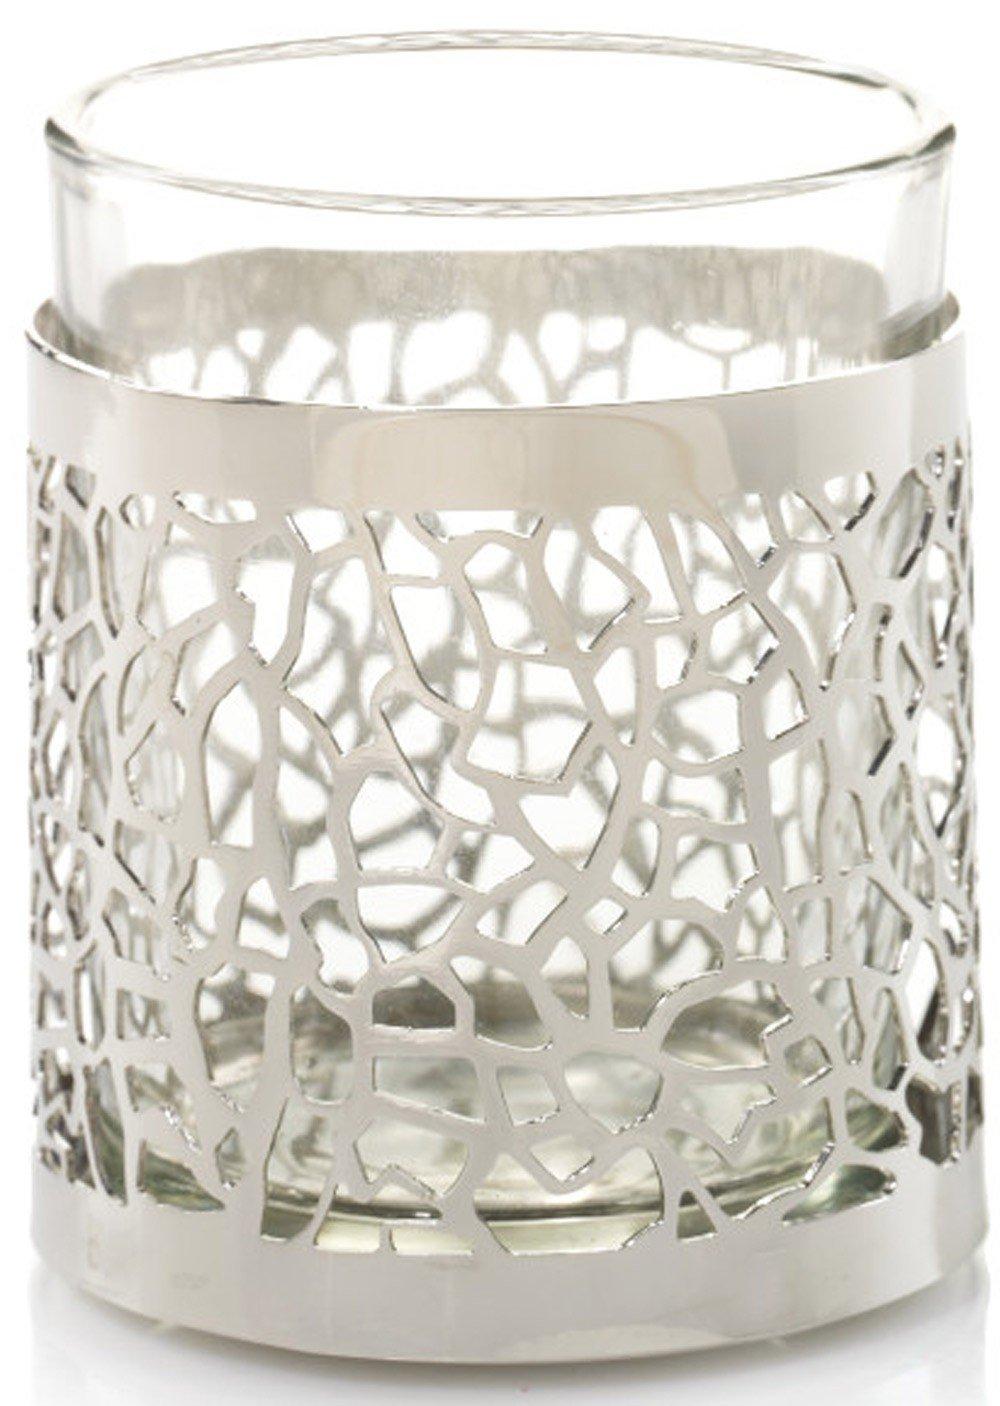 Yankee Candle-Porta candela, motivo: Matrix in argento spazzolato Yankee Candle Europe 1507953